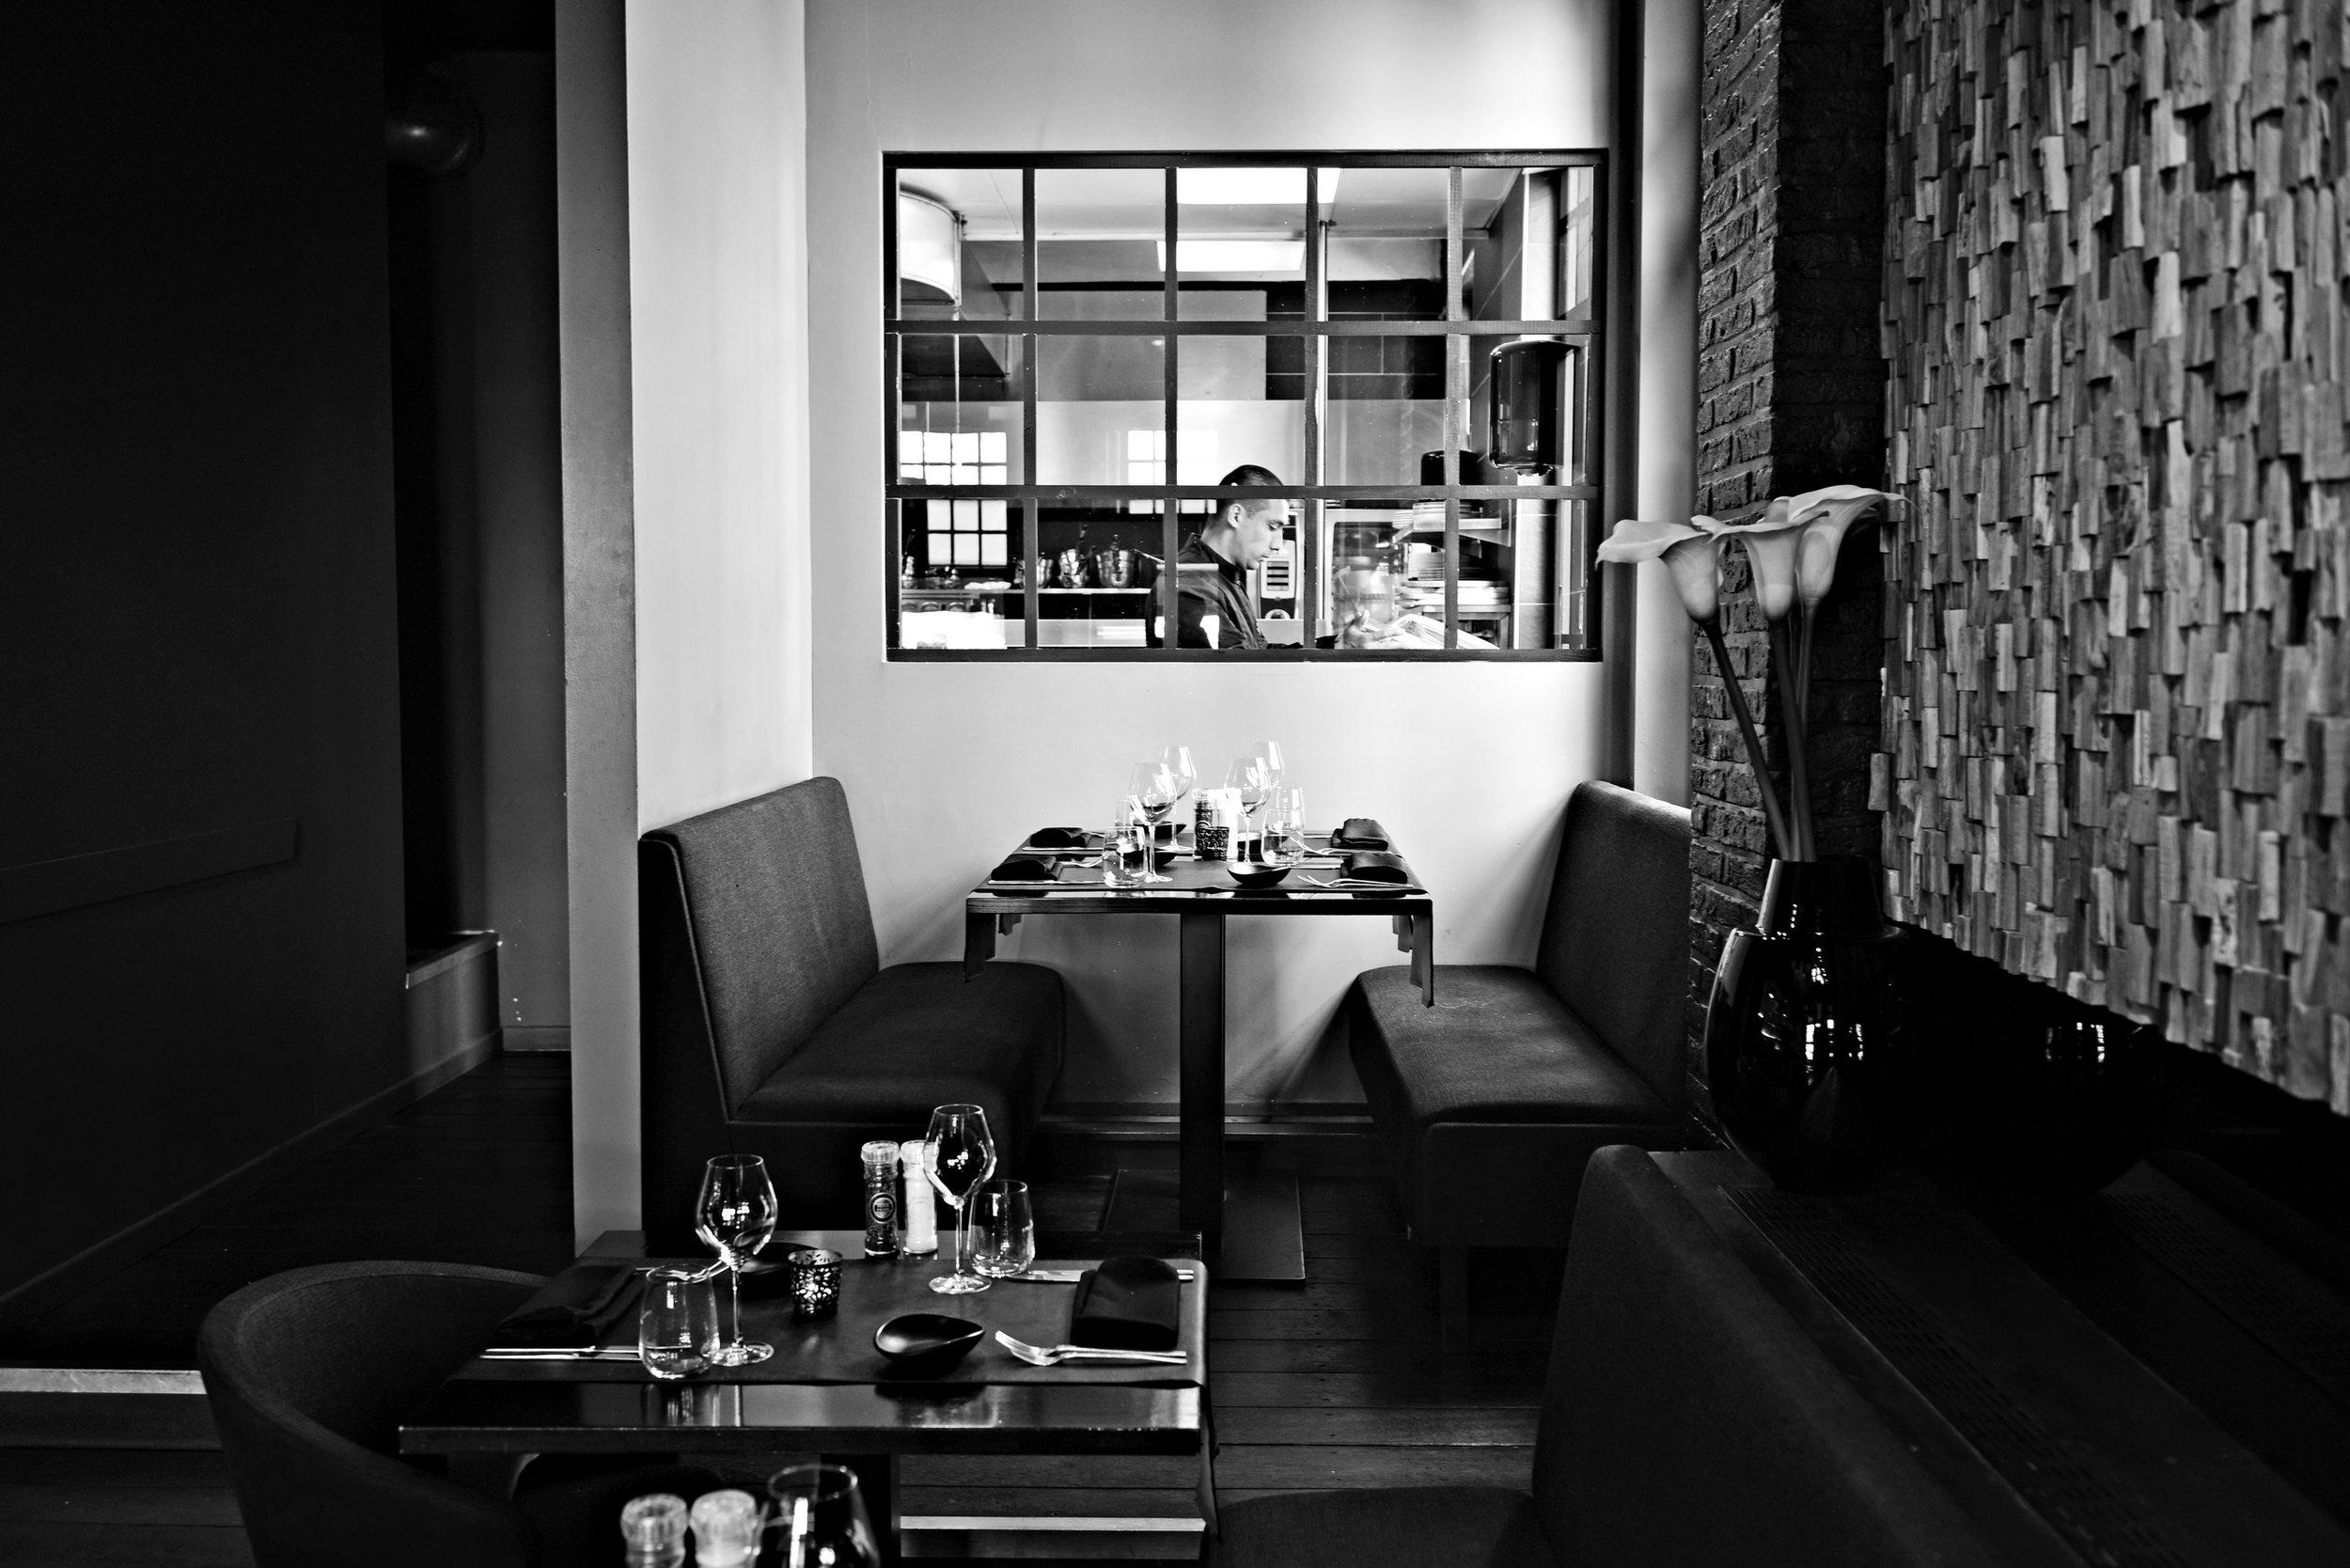 8 brasserie restaurant barleys barley's dendermonde grote markt bart albrecht tablefever.jpg